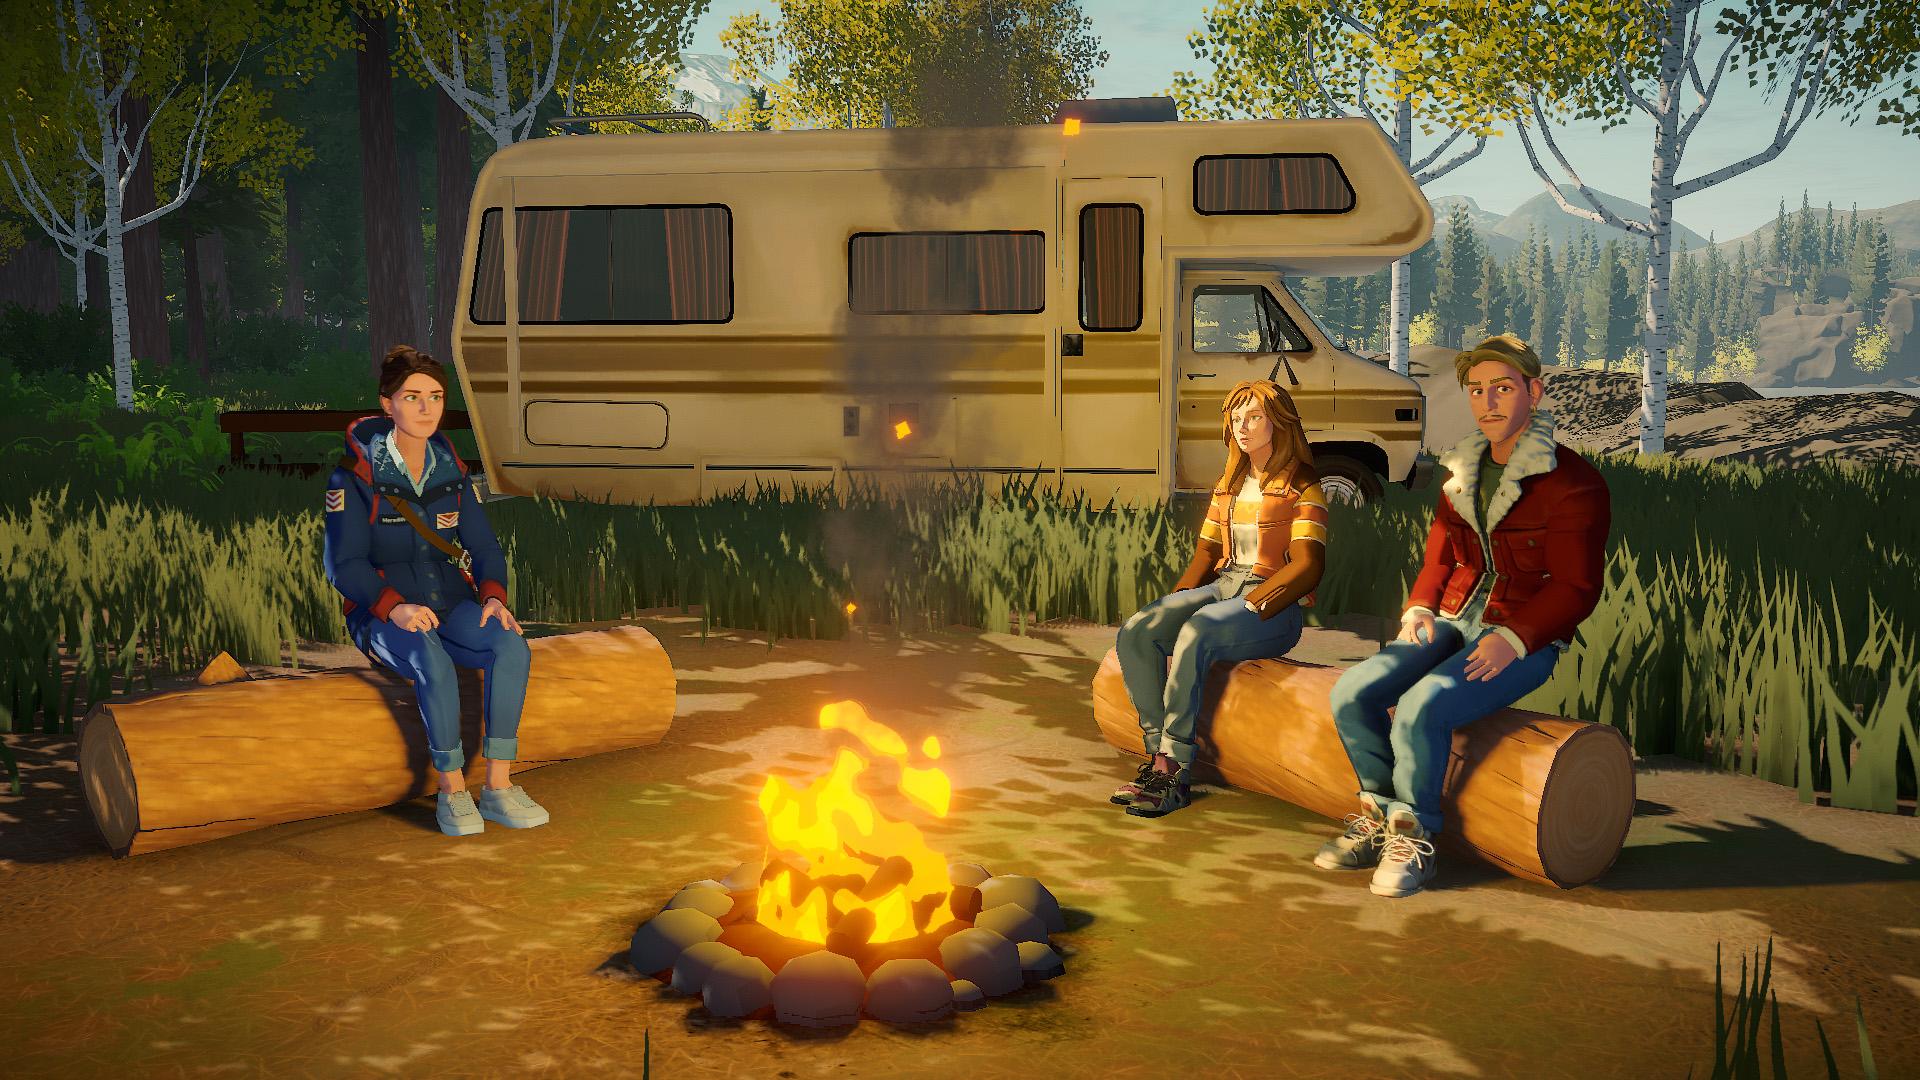 Lake people campfire